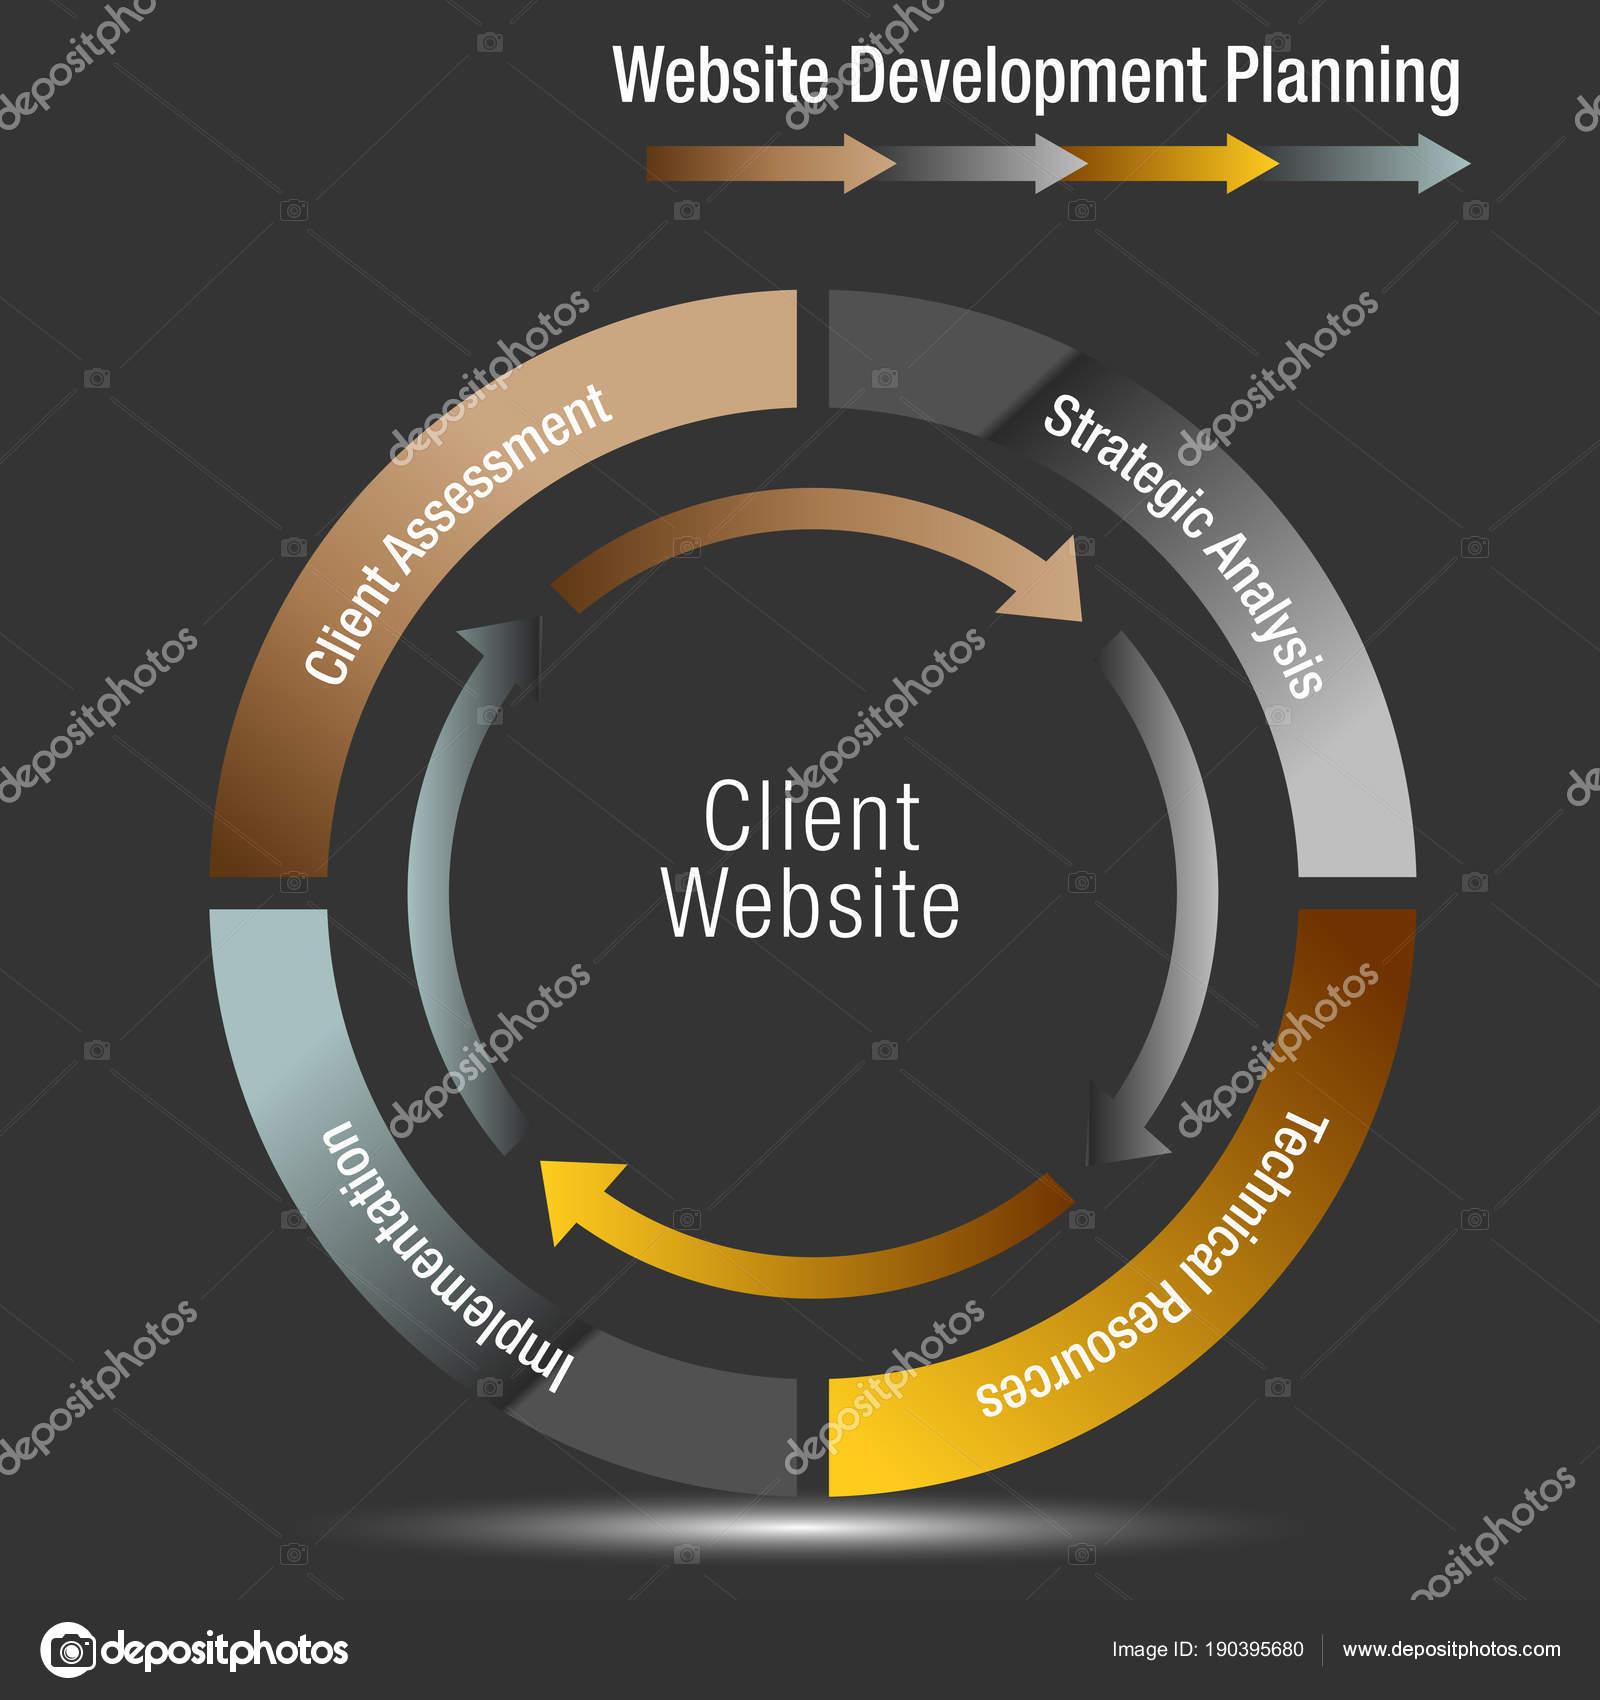 Kunden-Website Entwicklungsplanung Rad-Diagramm — Stockvektor ...